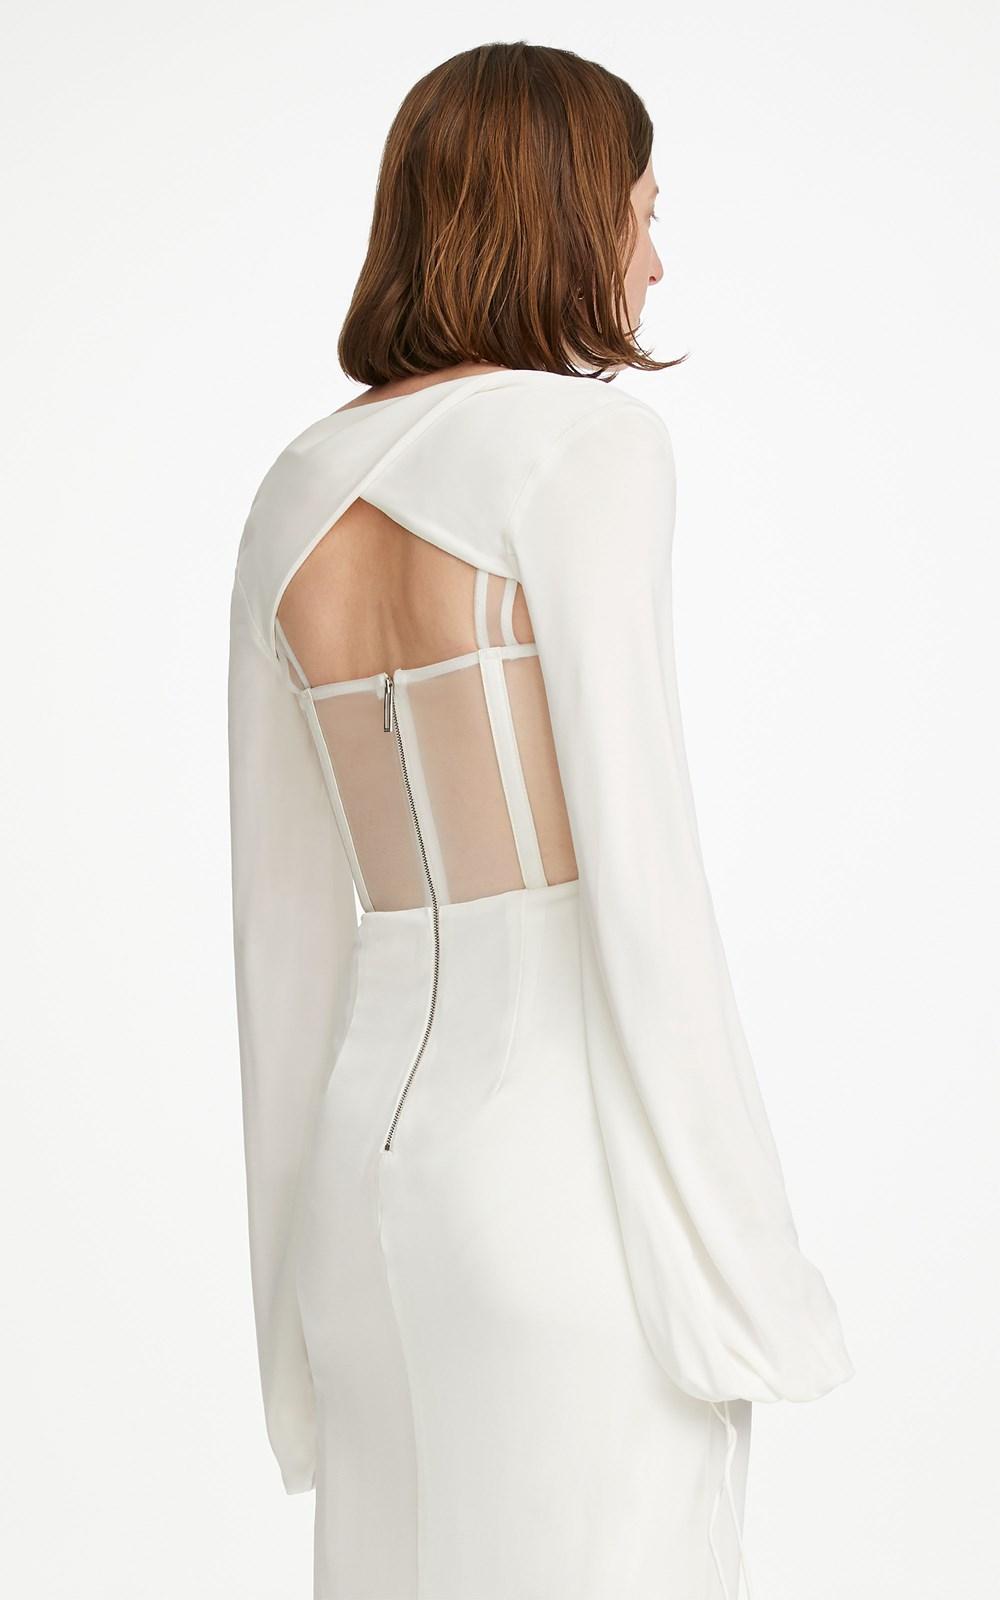 Dresses | VISCOSE JERSEY TWIST CORSET DRESS